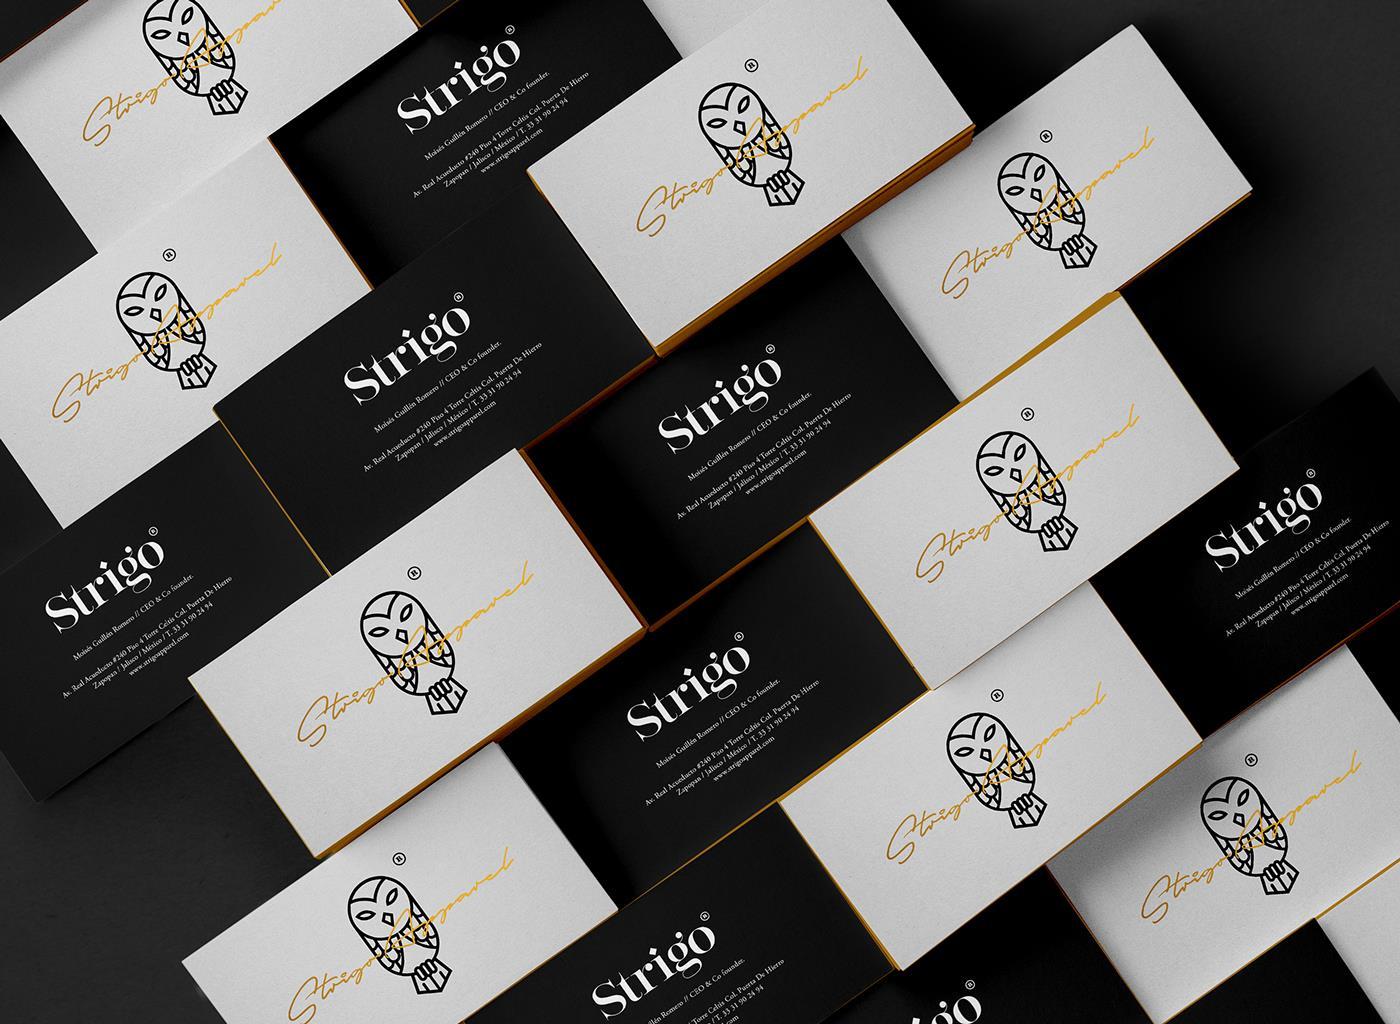 Atelan时尚服装展示机构品牌设计   Atelan品牌设计面临的挑战主要是创造一个可以涵养两个市场的品牌形象,得到设计师和消费者的青睐,对于设计师来说品牌代表的卓越才华的独家社区,对于消费者来说这里是奢侈品的品牌溢价。品牌形象的设计从两件事中汲取灵感:一个是服装设计过程中产生的装束,另一个则是标记描绘礼服形式。其中设计师构建自己的衣服(也称为人体模型),而菱形的图案是一个当代承担线程交错。我们选择灰色和蓝色的颜色不同的调色板结合光图案陪标志。其结果是一个强大又不失女人味会徽是伴随着传达真实性和排他性各